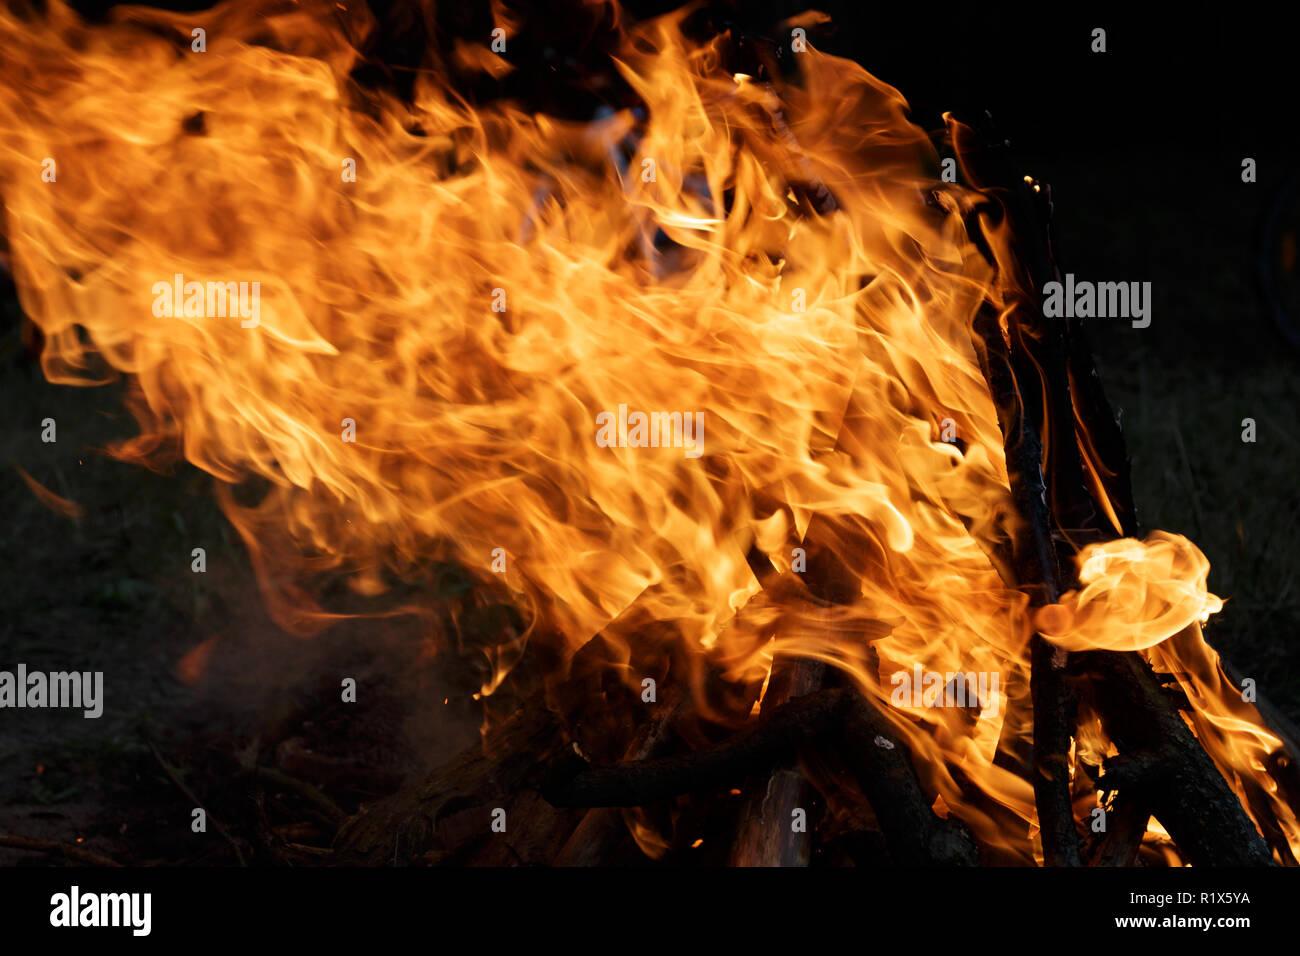 A burning fireplace Stock Photo